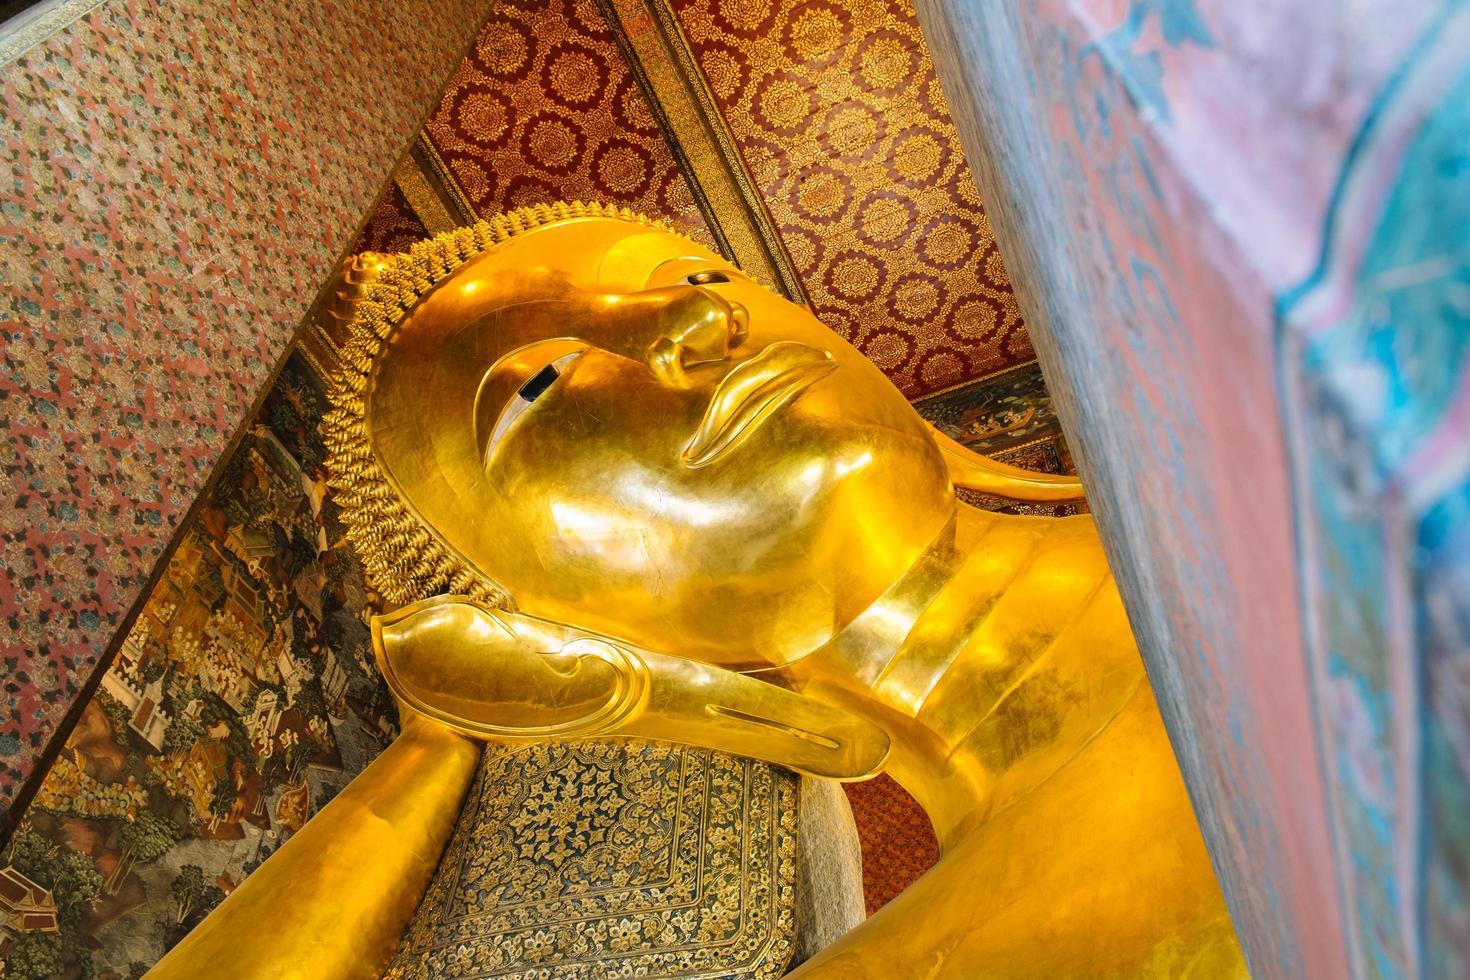 gigantesca statua dorata del Buddha sdraiato foto